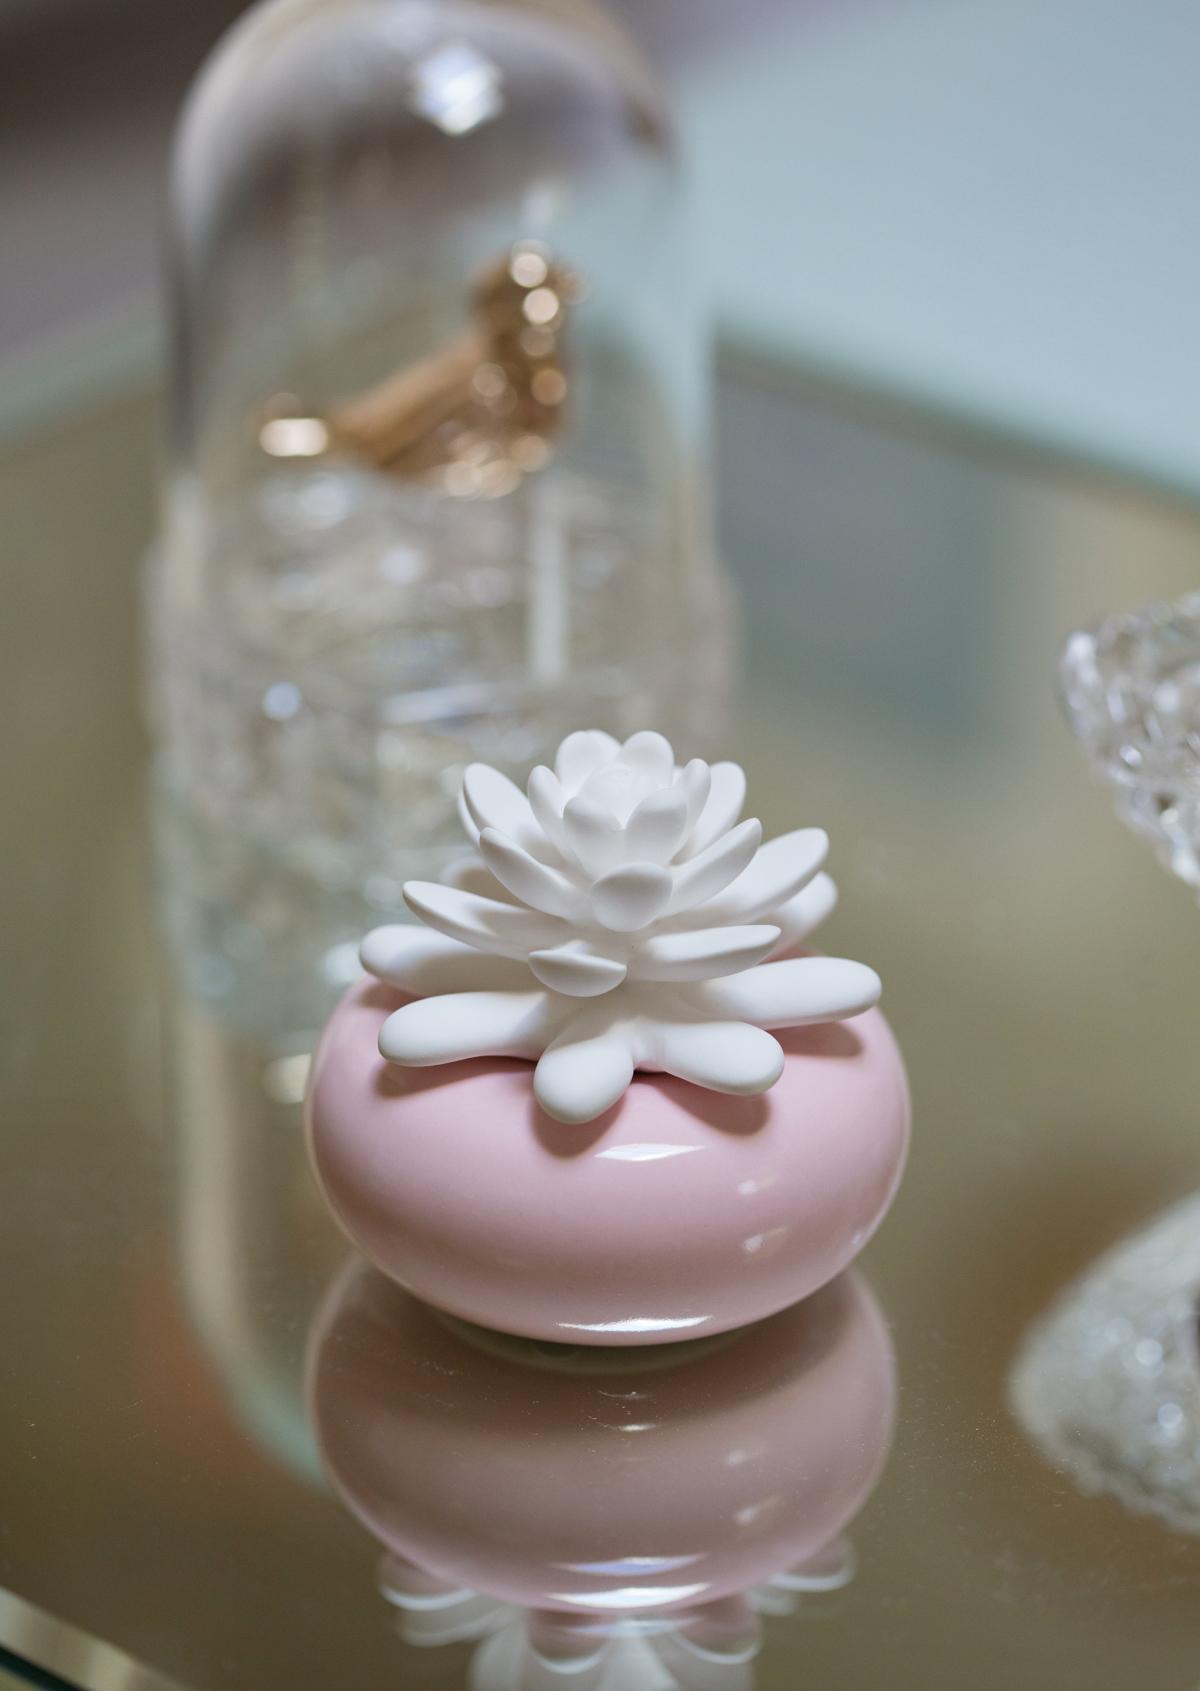 chando-fragrance-0380